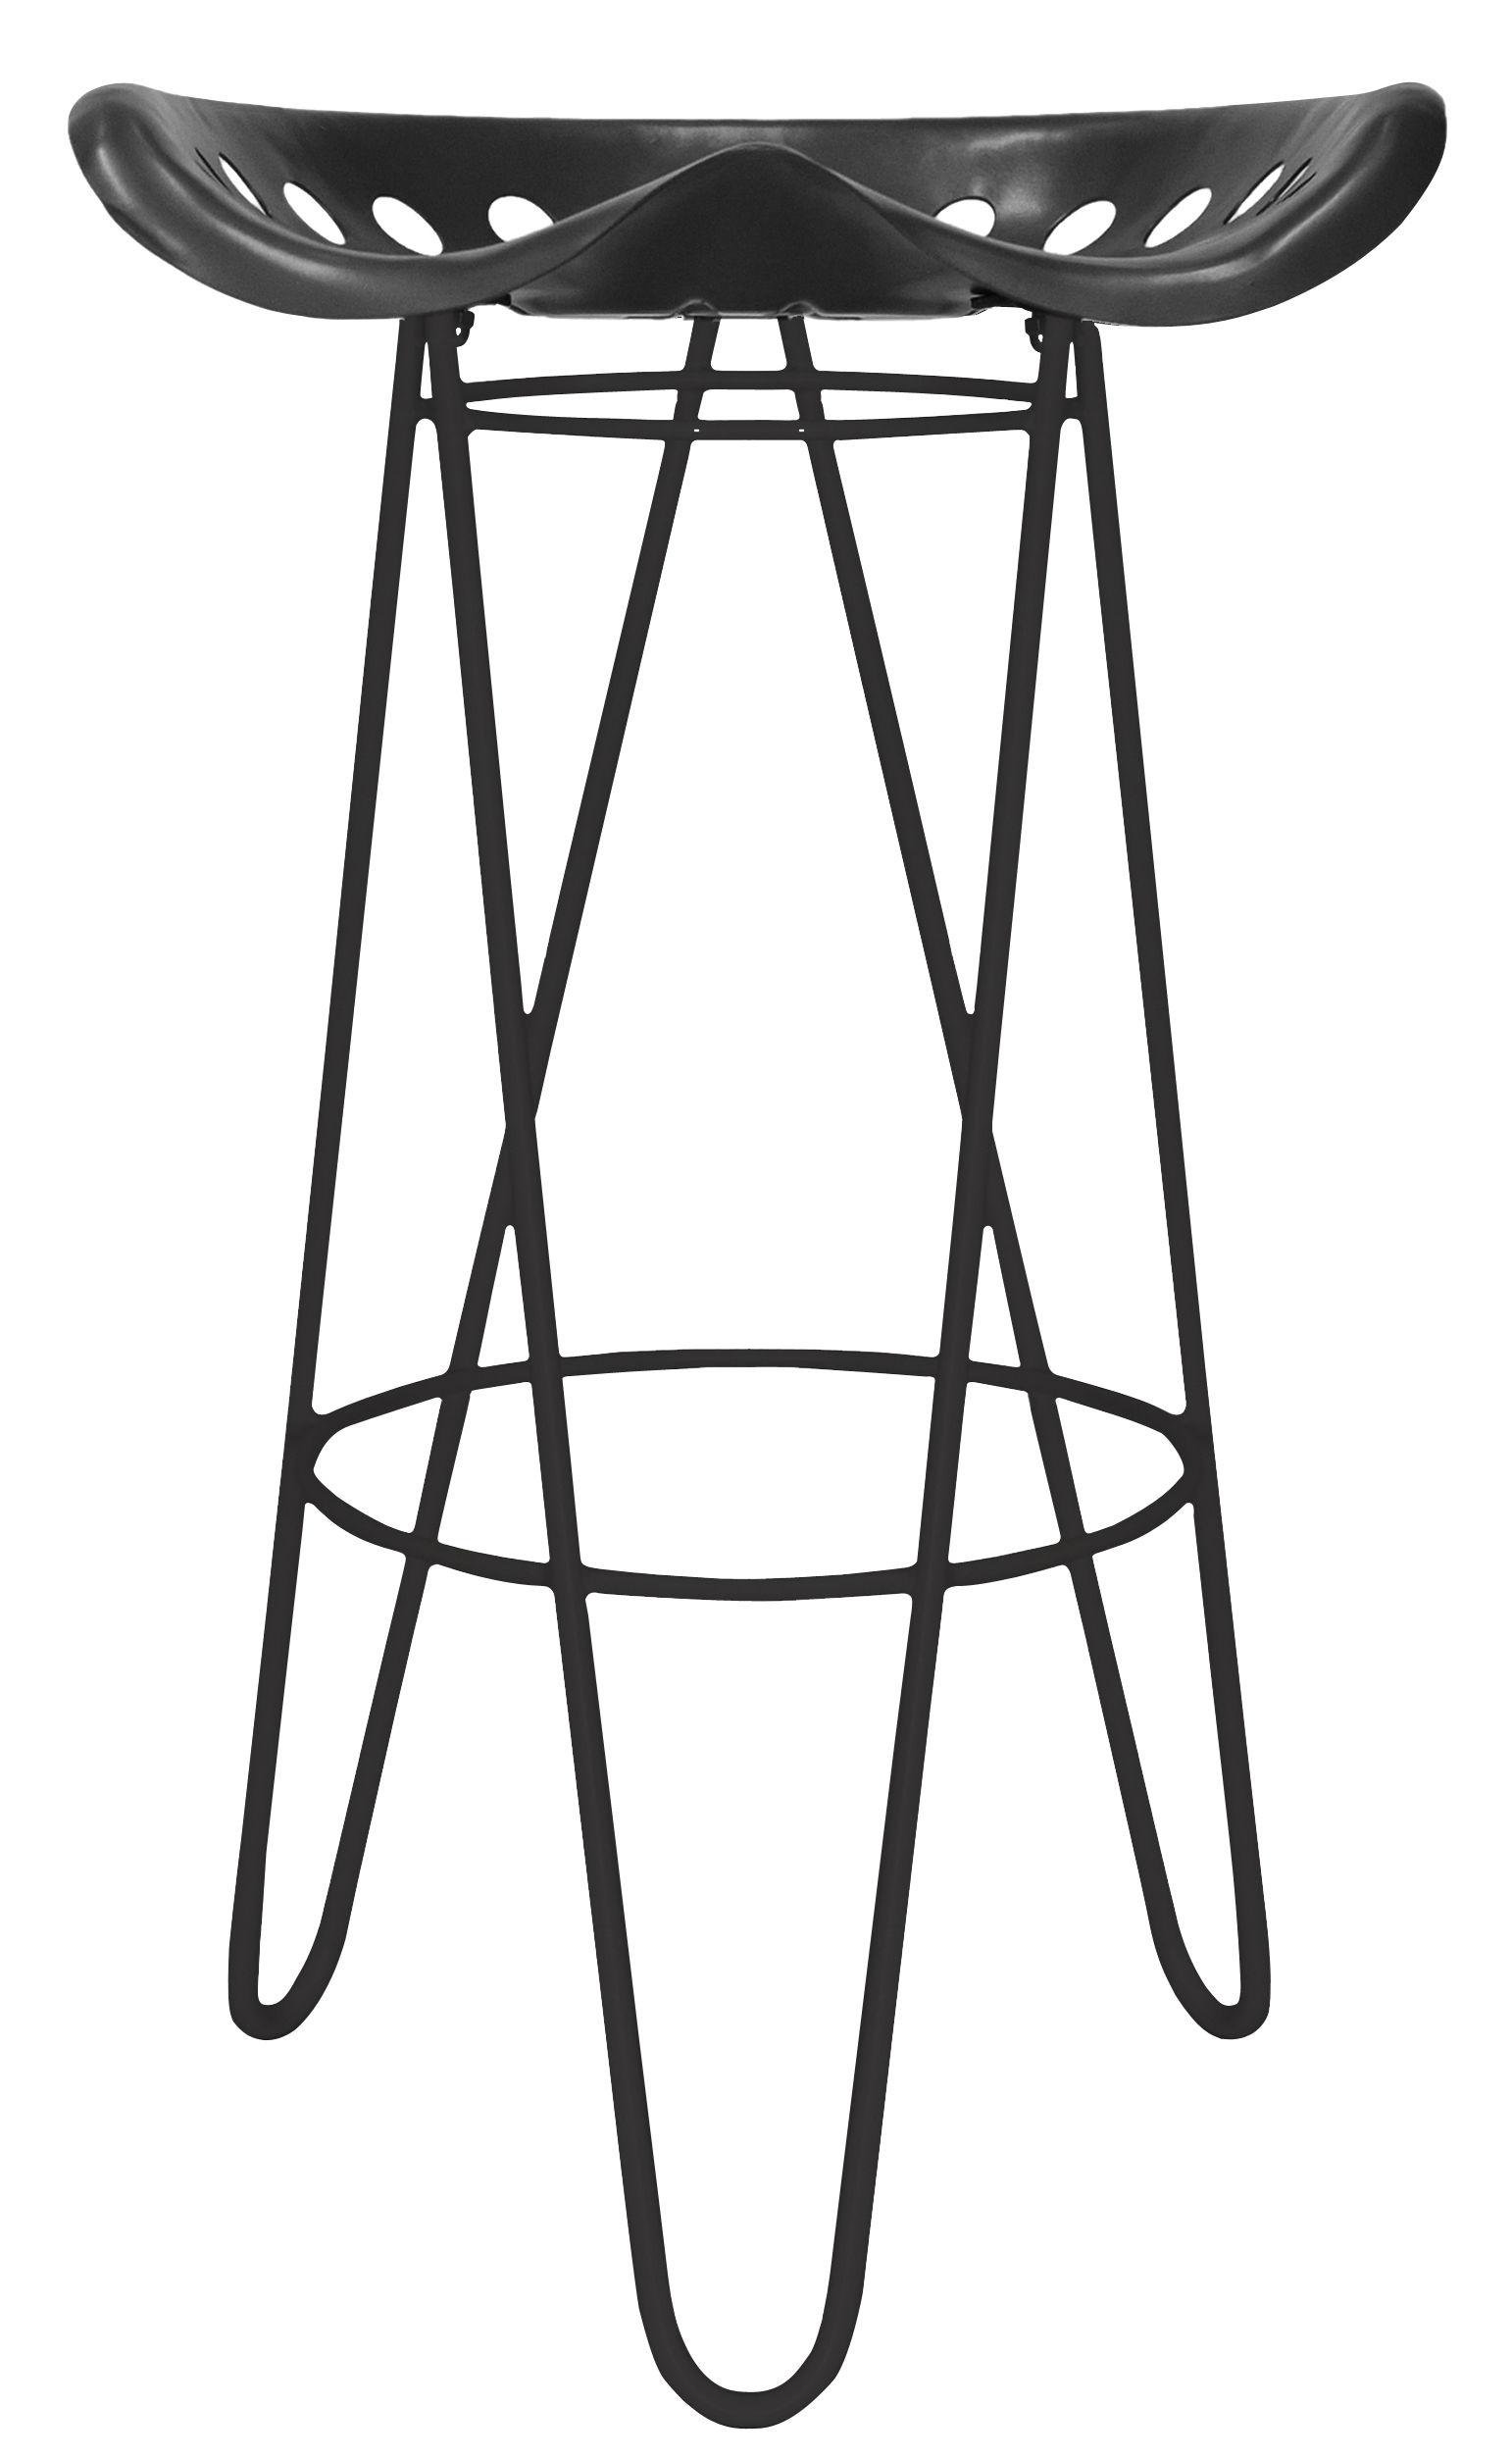 gouvy bar stool h 65 cm metal black by nantavia. Black Bedroom Furniture Sets. Home Design Ideas